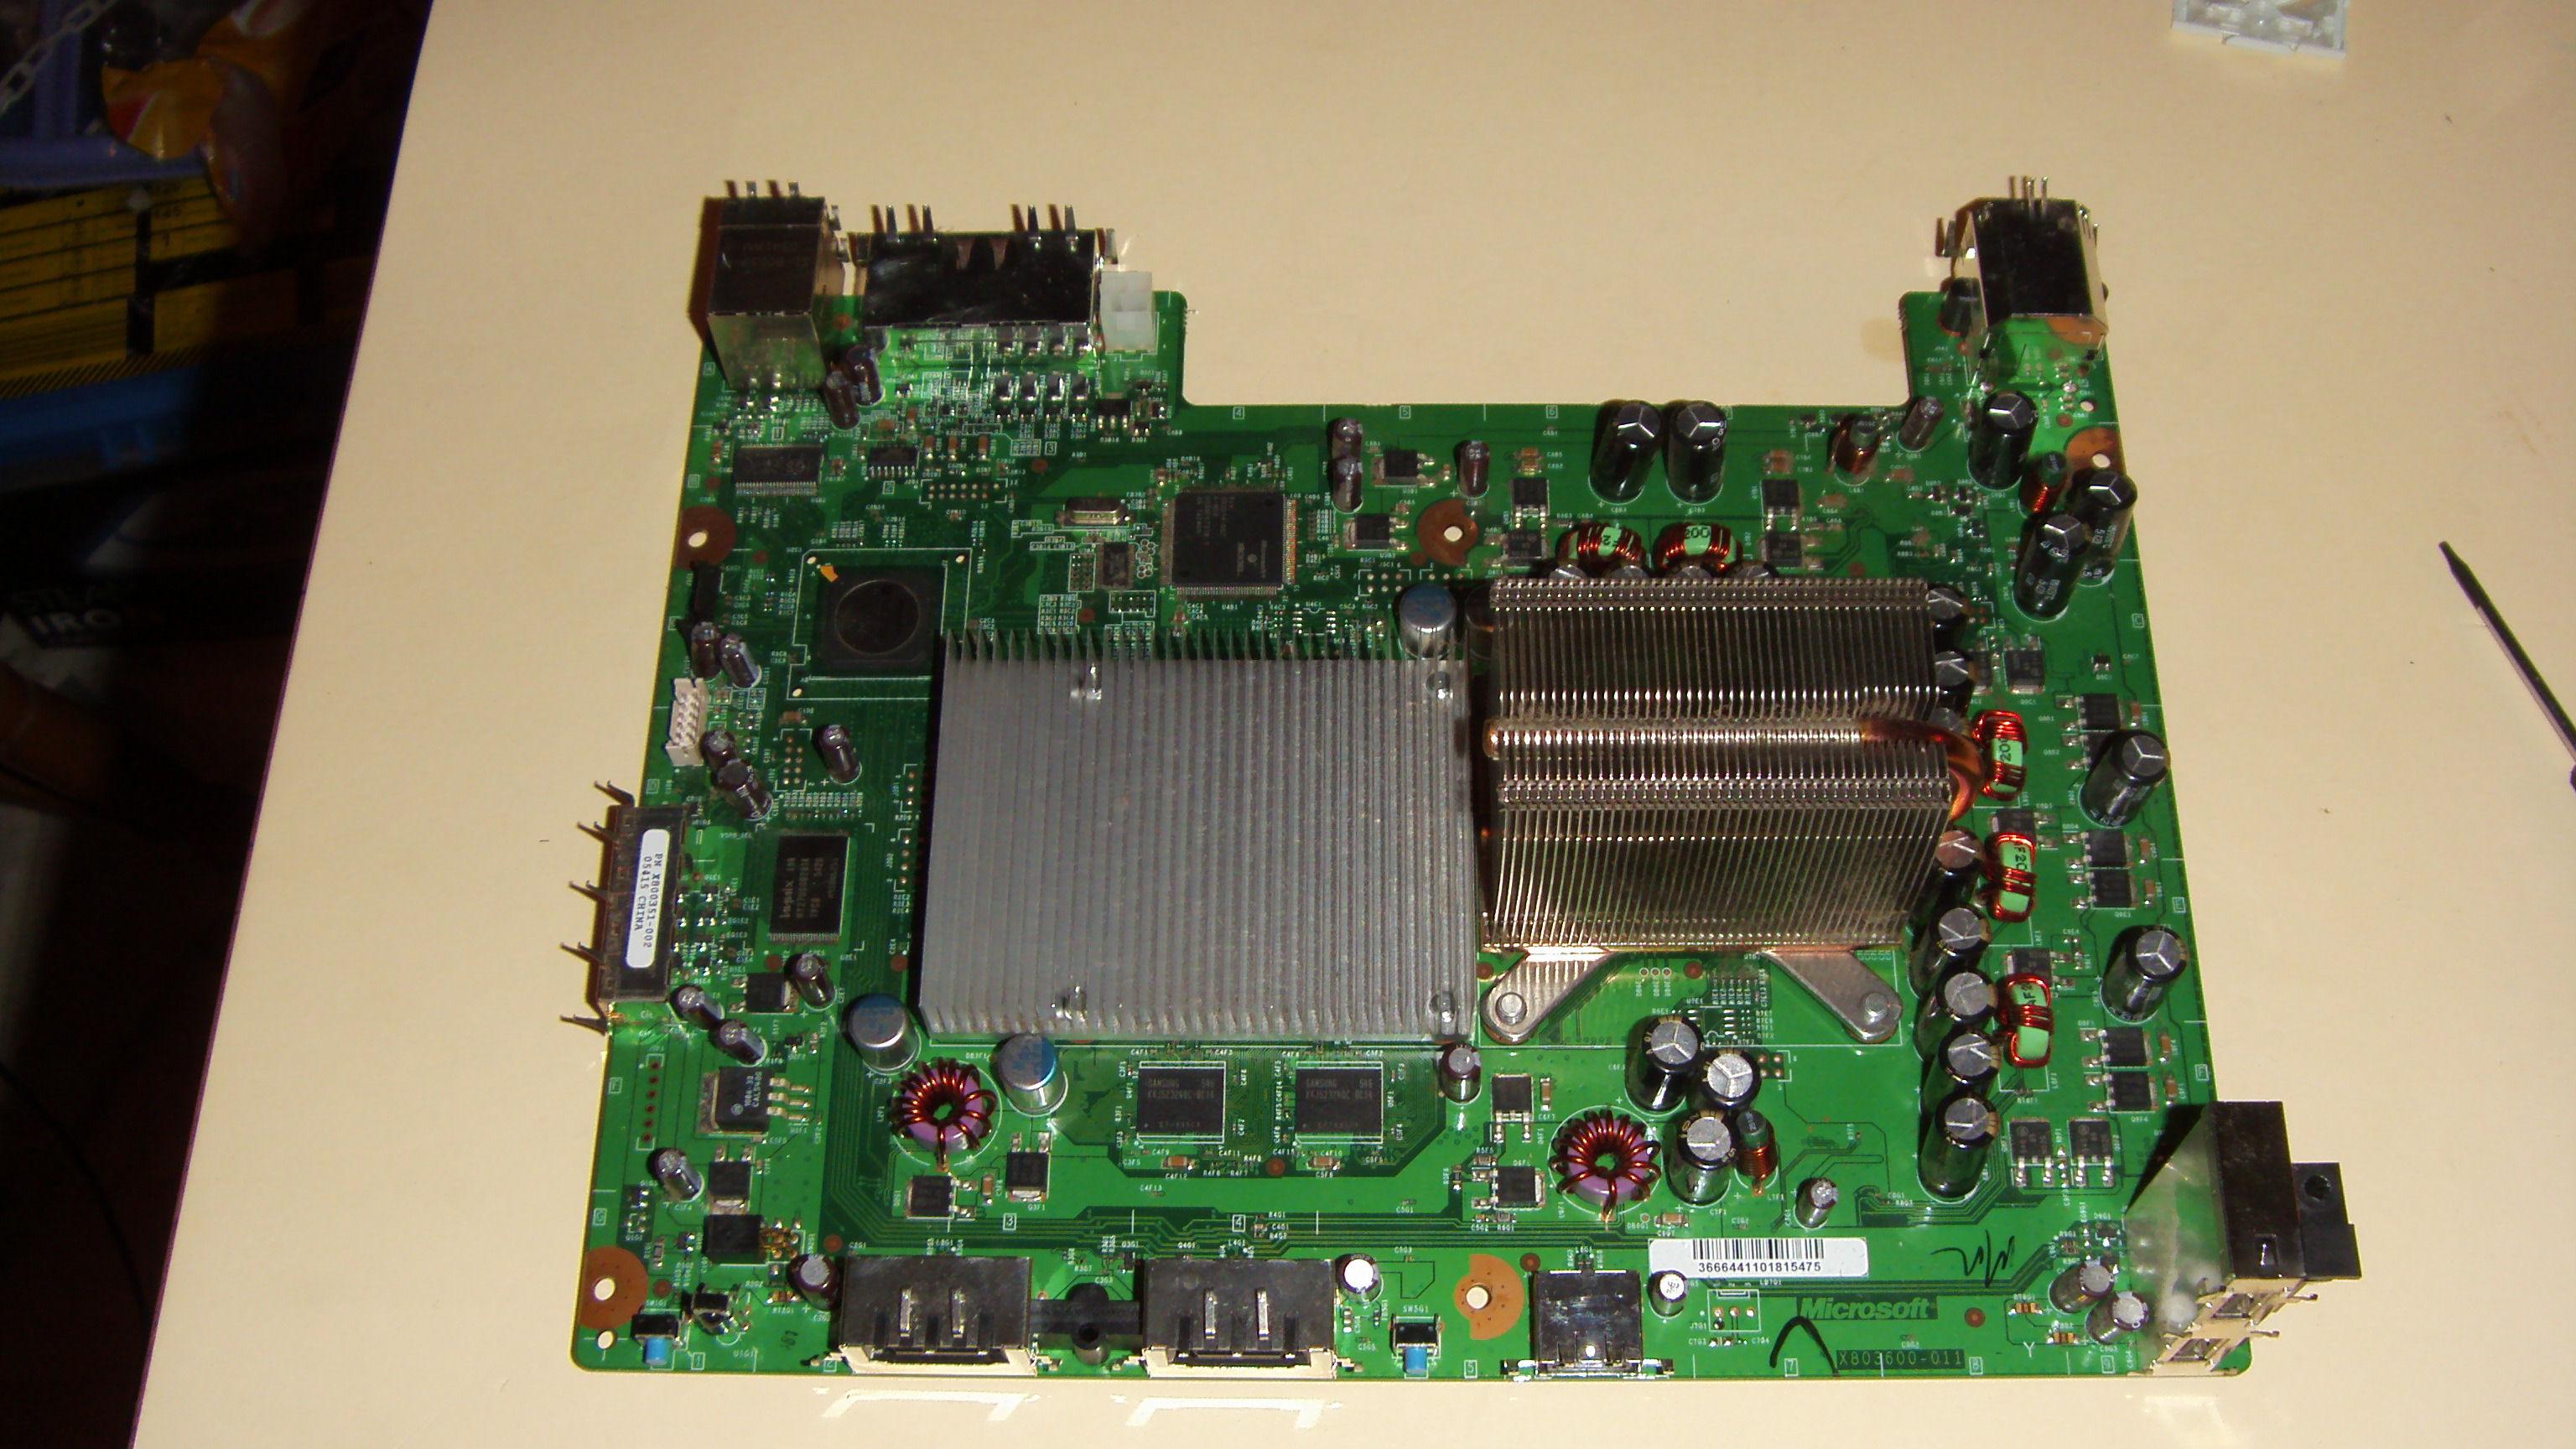 disemble_x360_37_lg Xbox Motherboard Fuse on wii u motherboard, ps4 motherboard, xbox support number 1800, iphone motherboard, ipad 2 motherboard, playstation 4 motherboard, small robot motherboard, commodore pet motherboard, 360 controller motherboard, xbox slim motherboard, ps2 motherboard, playstation 1 motherboard, sega dreamcast motherboard, xbox clock capacitor, game console motherboard, nintendo motherboard, original xbox motherboard, xbox motherboard types, xbox v1, sega genesis motherboard,